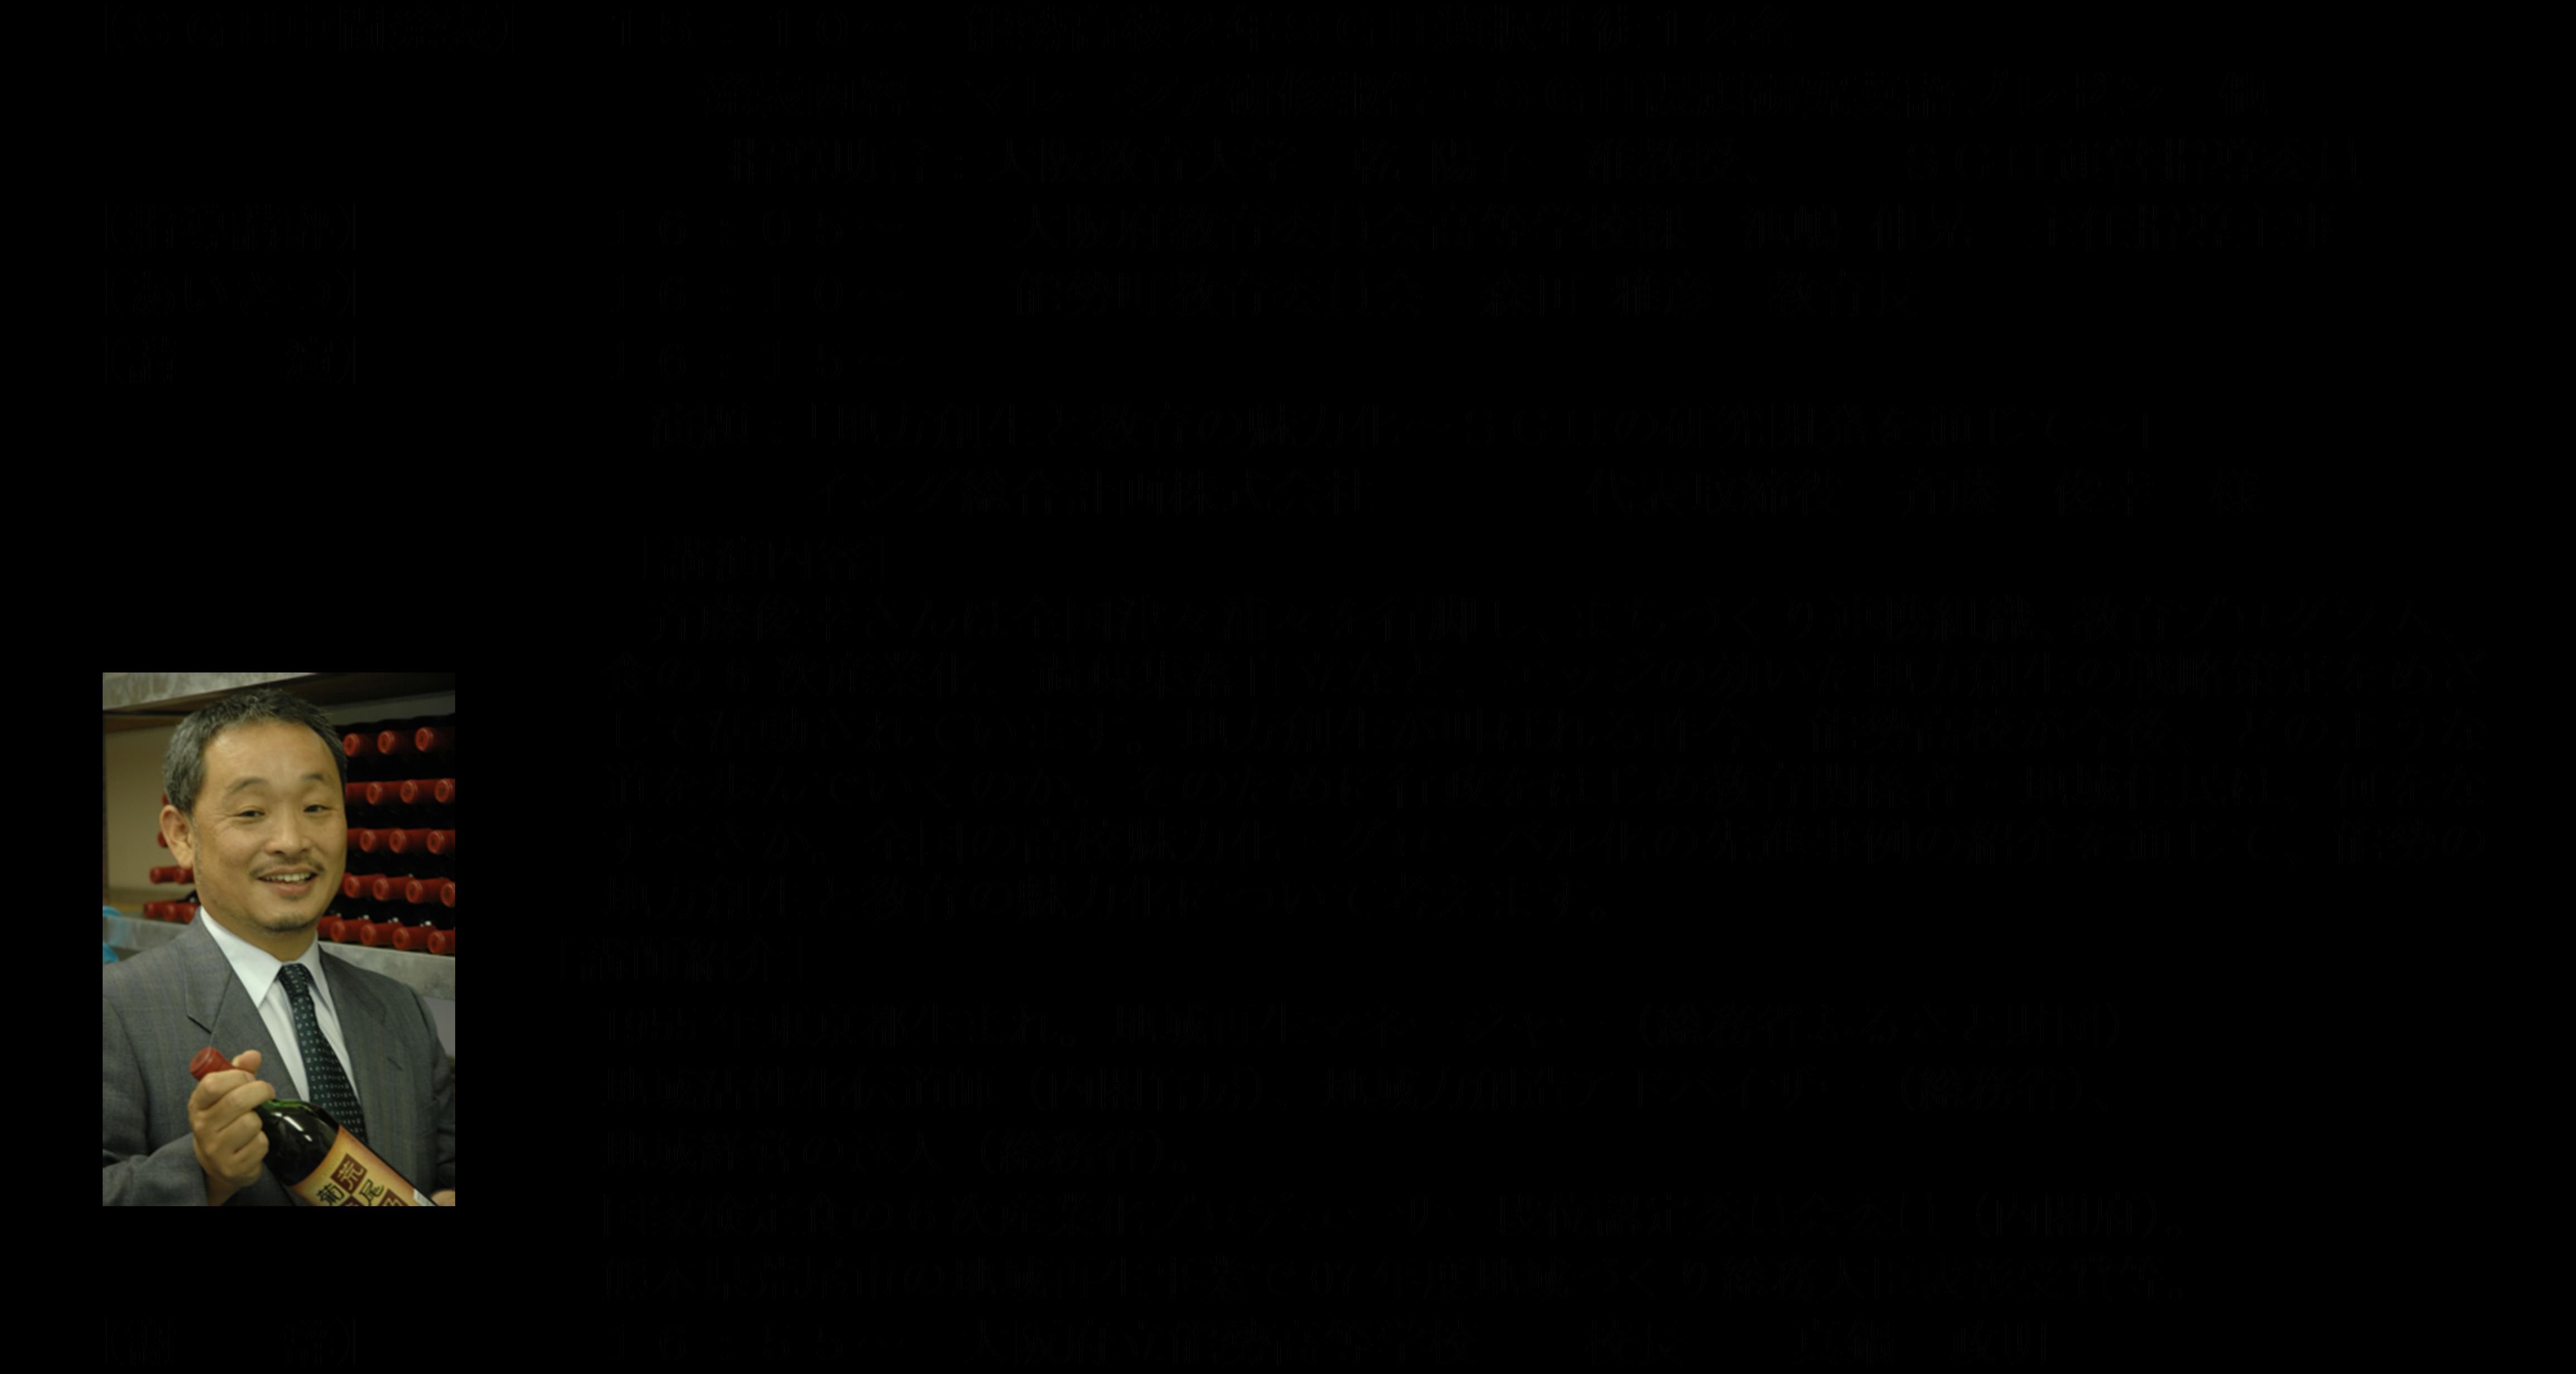 H271120開催要項(全体会)